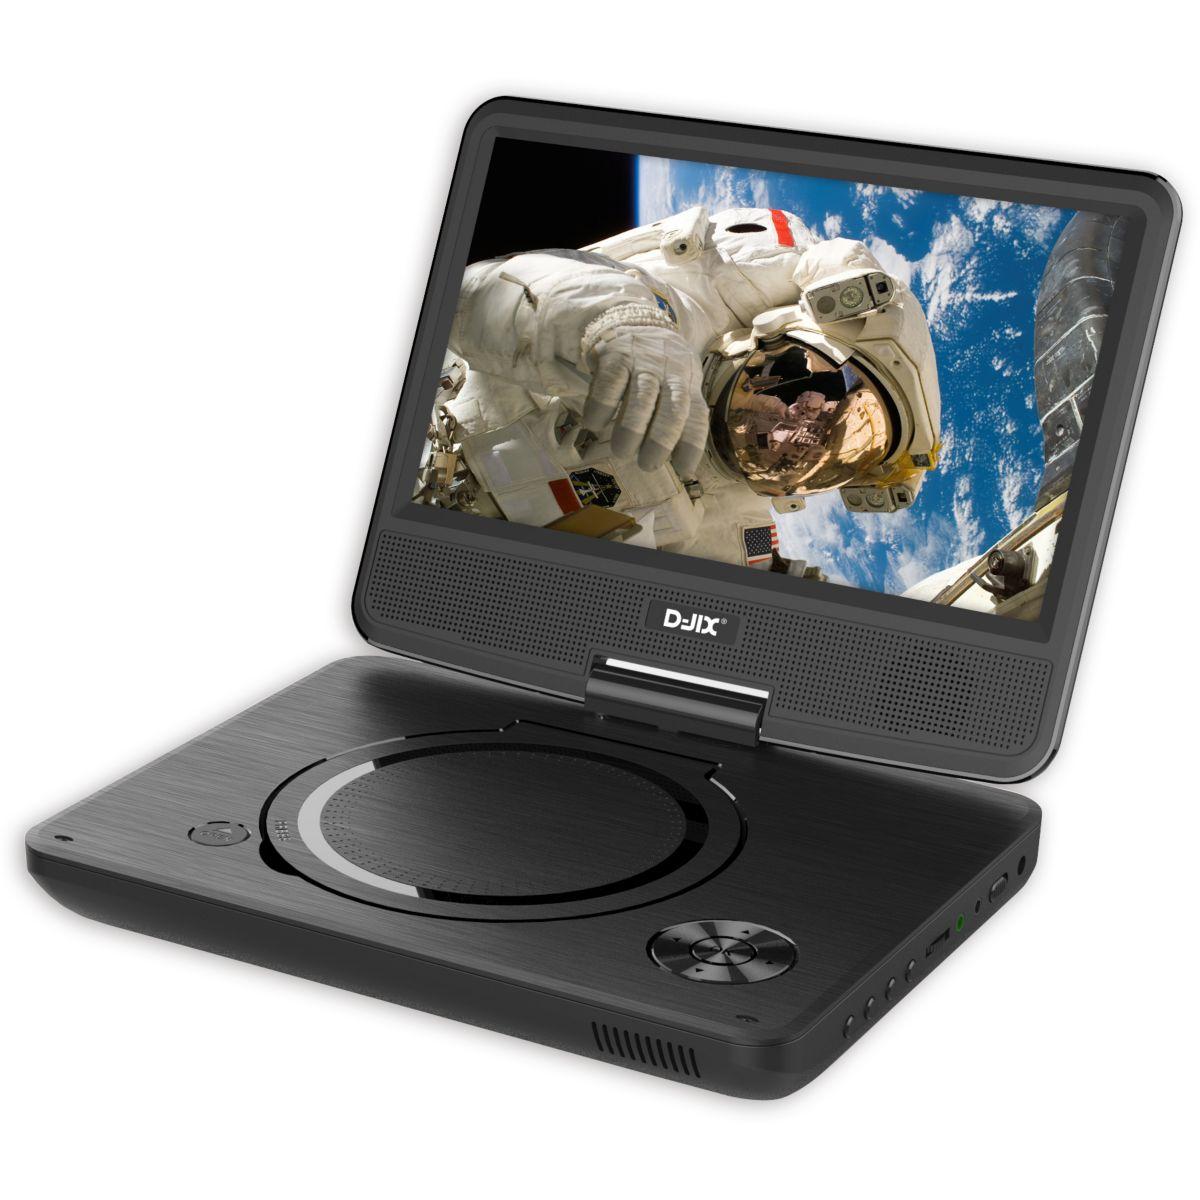 DVD Portable D-JIX PVS 906-20 (photo)